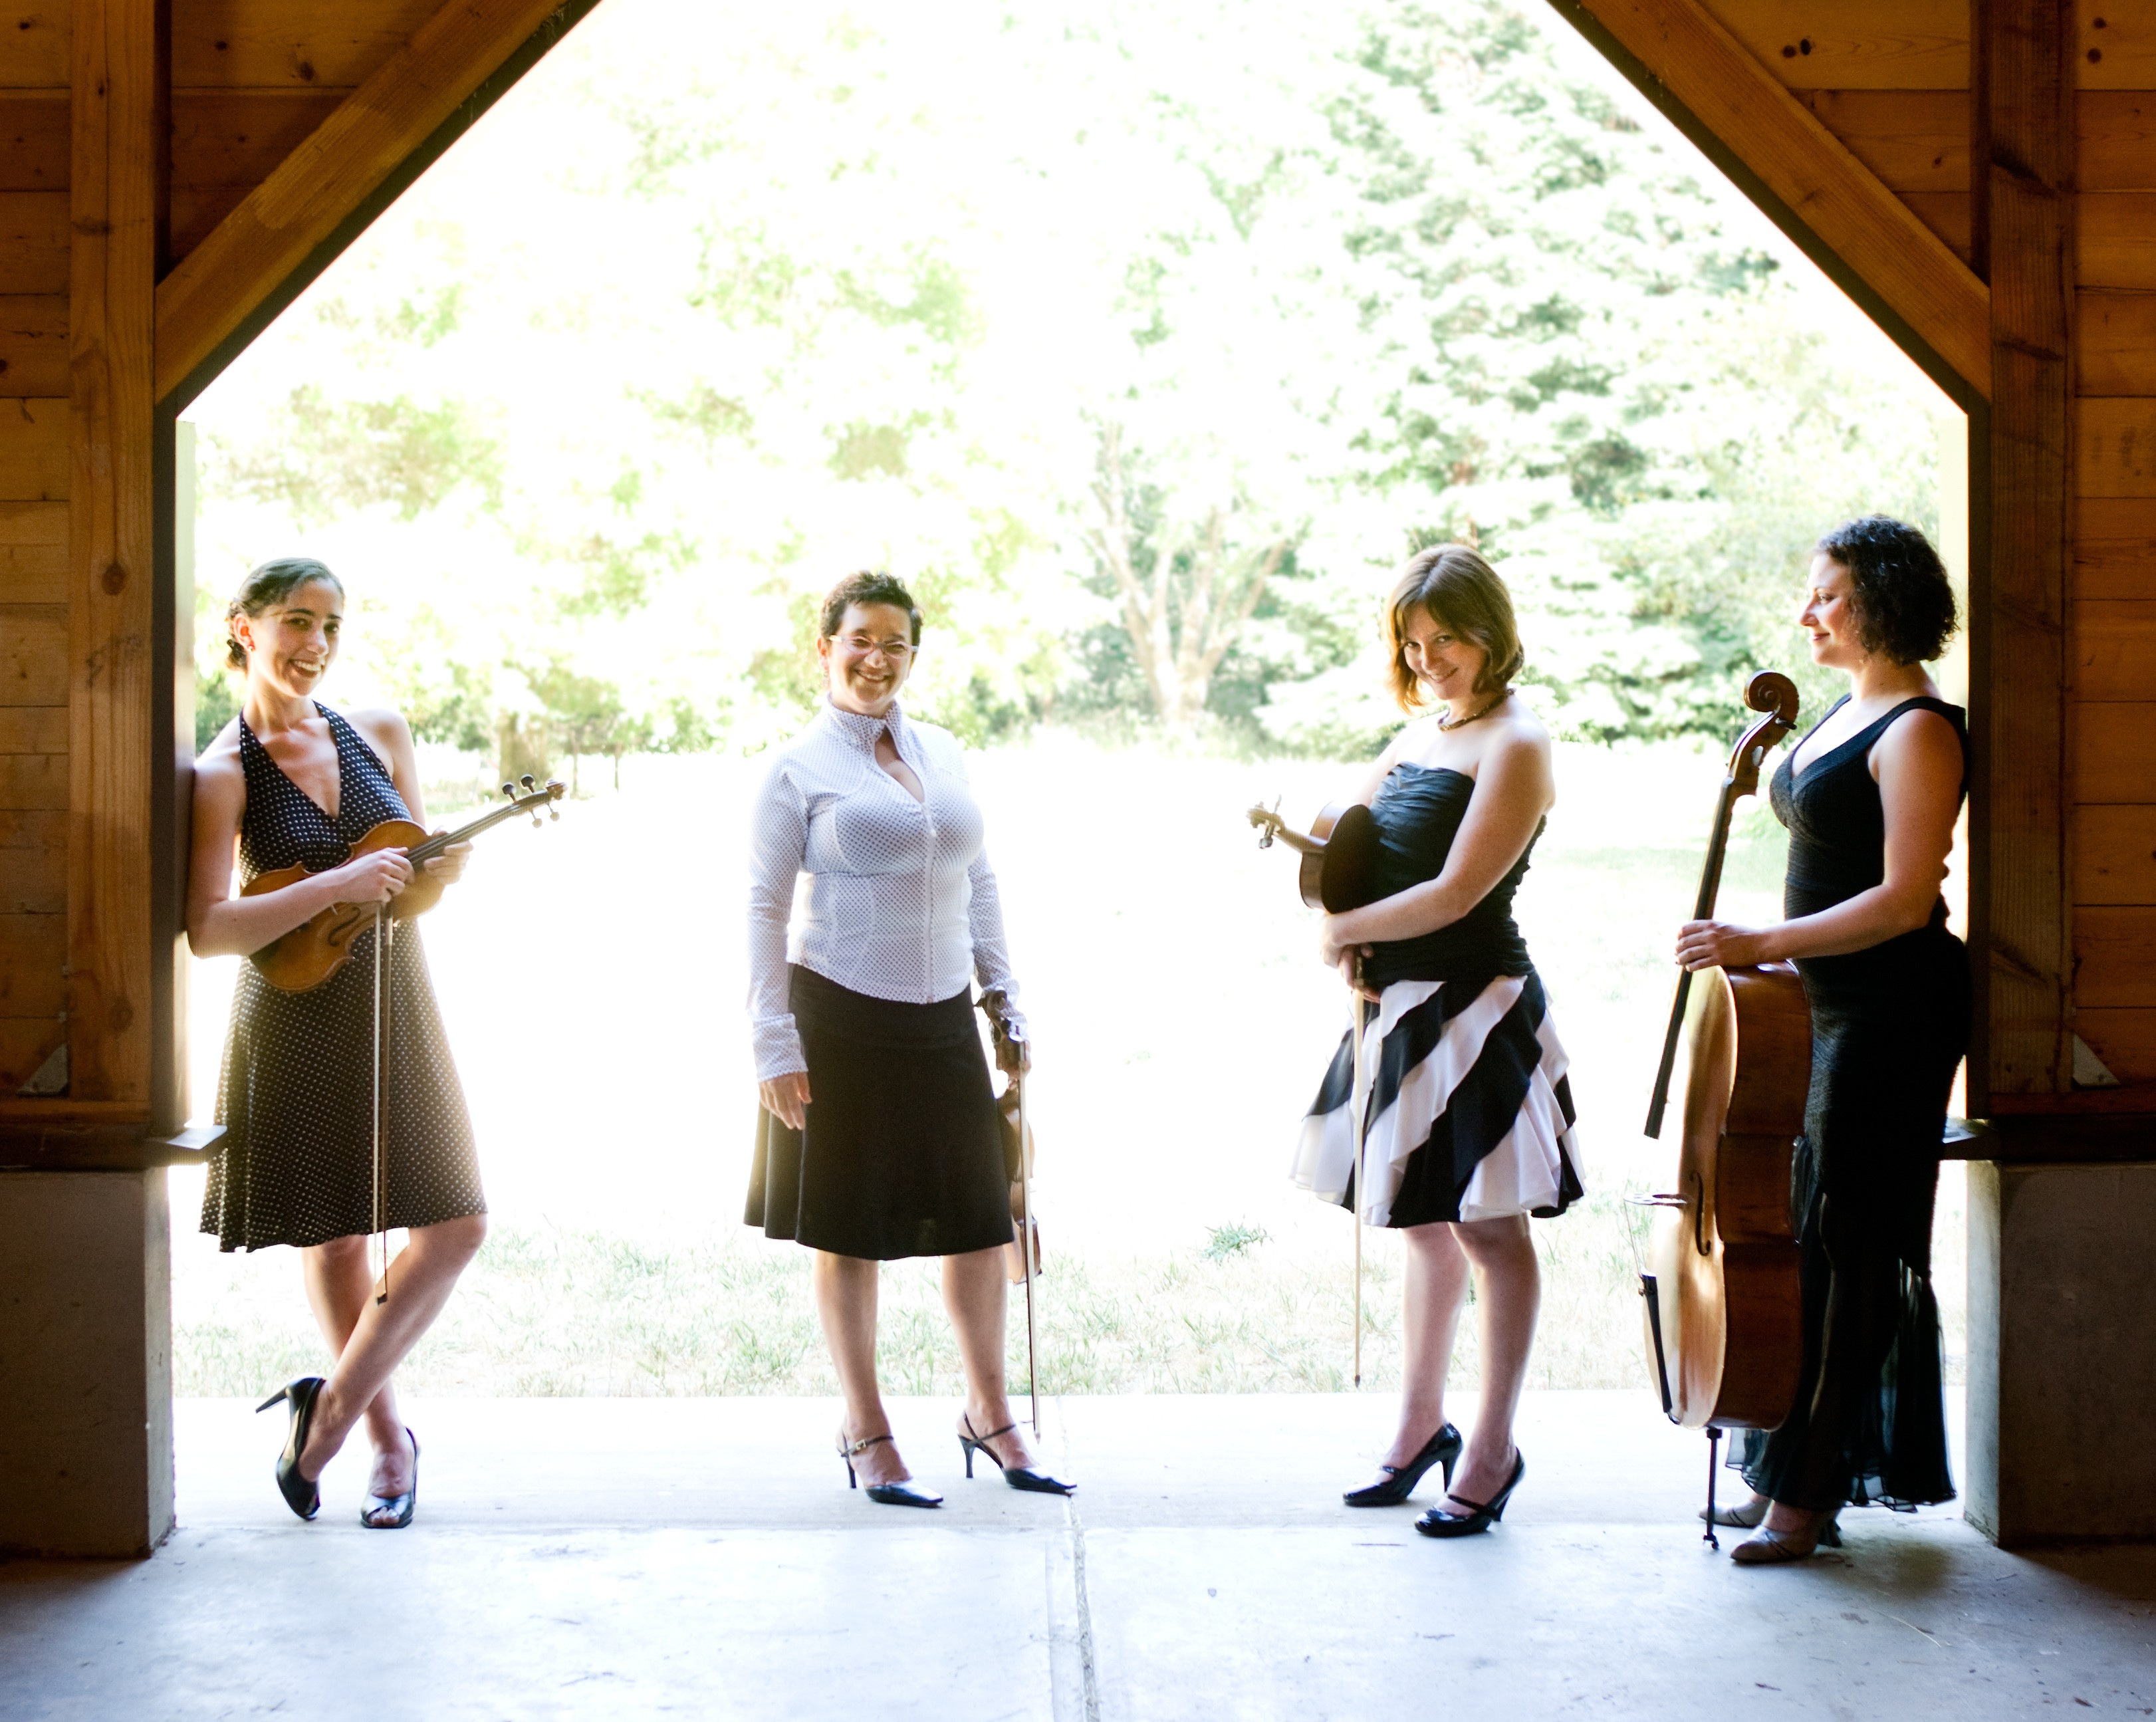 Real Vocal String Quartet - PHOTO BY LENNY GONZALEZ